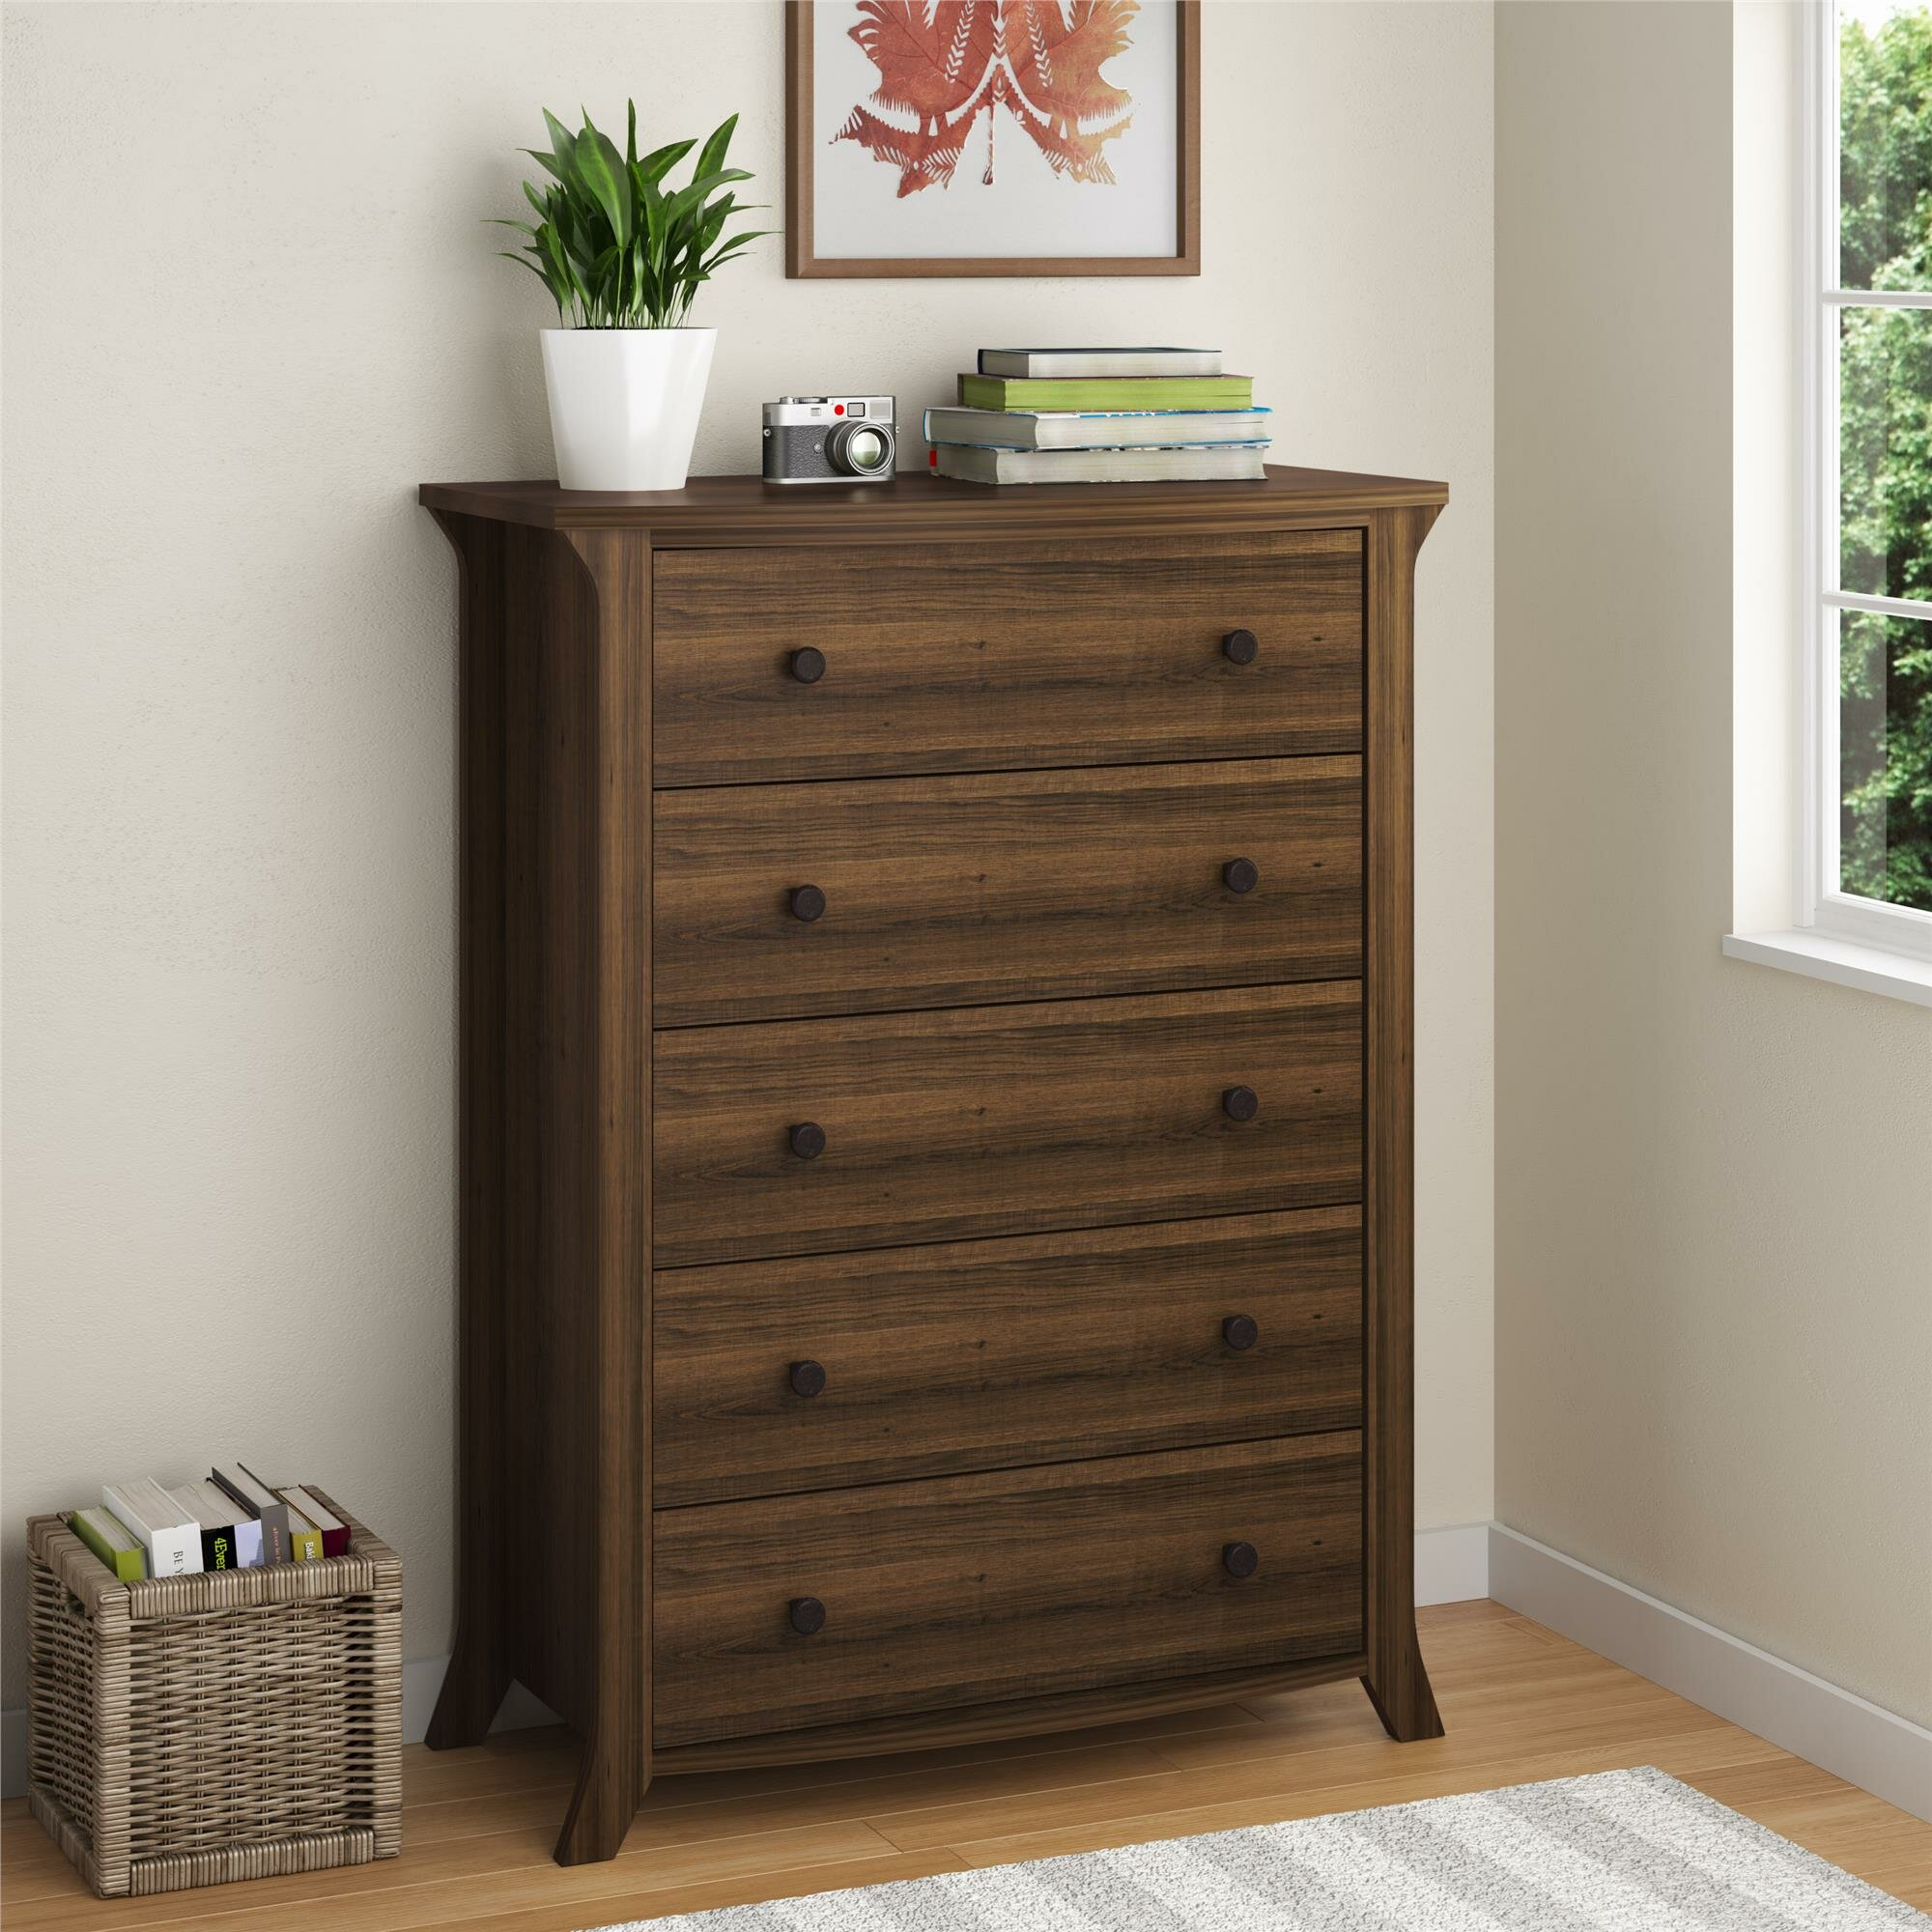 Oakridge Bedroom Furniture Altra Oakridge 5 Drawer Chest Reviews Wayfair